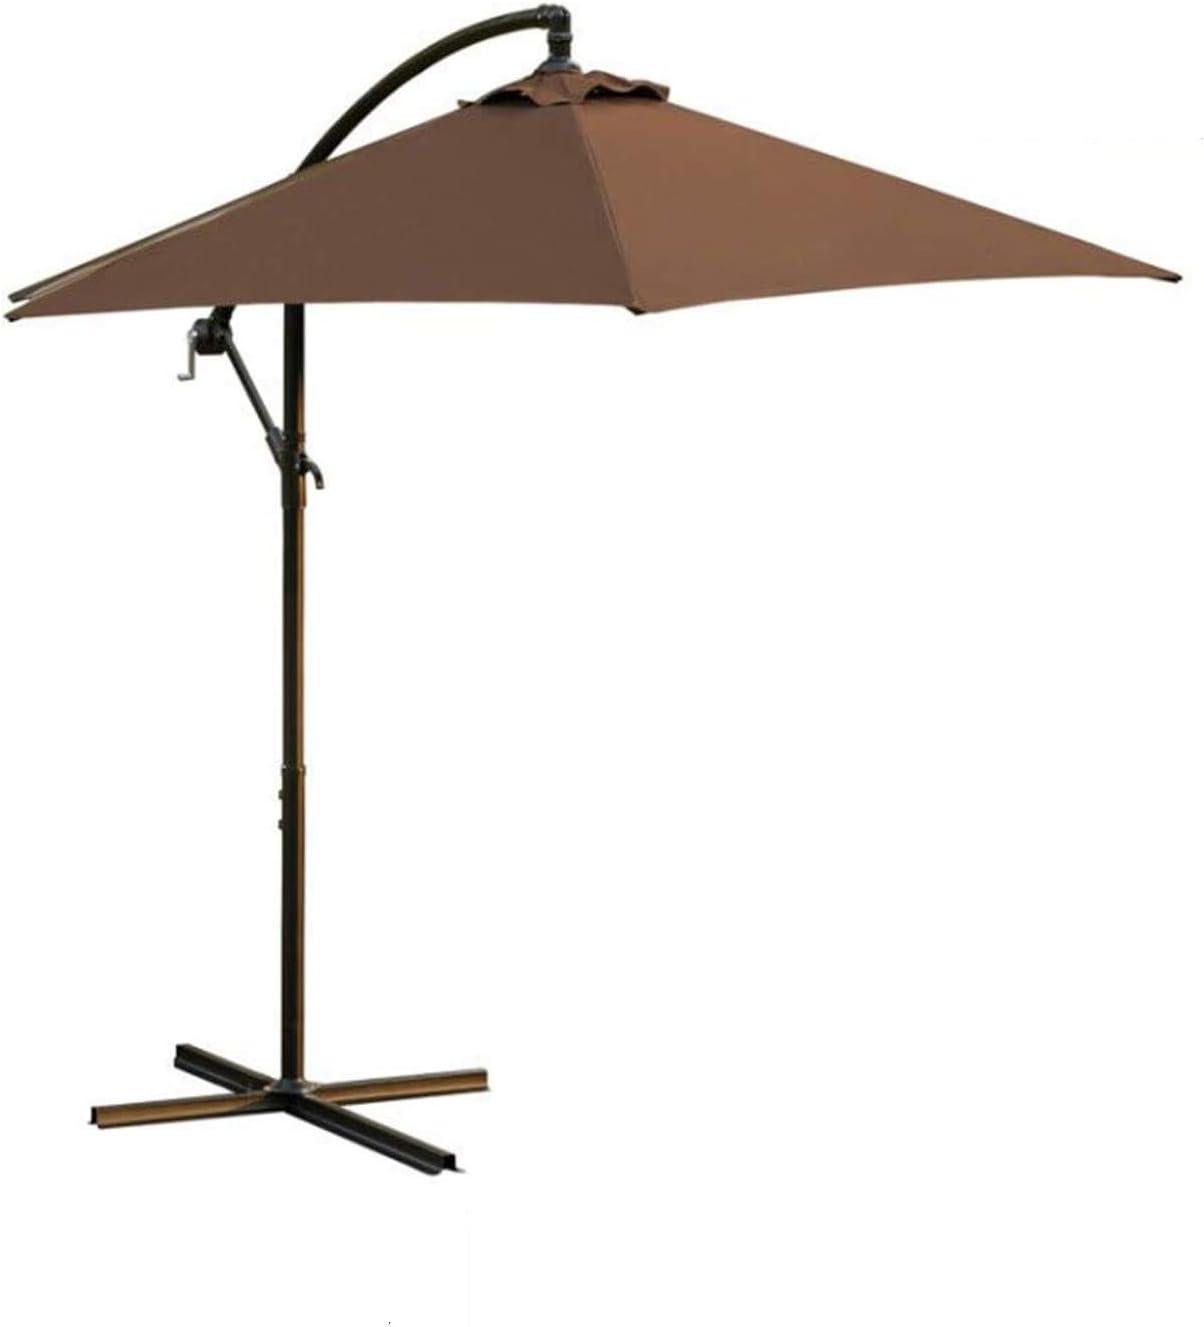 LOKATSE HOME 10 Ft Offset Cantilever Outdoor Patio Hanging Market Backyard Umbrella with Crank & Cross Base, Brown